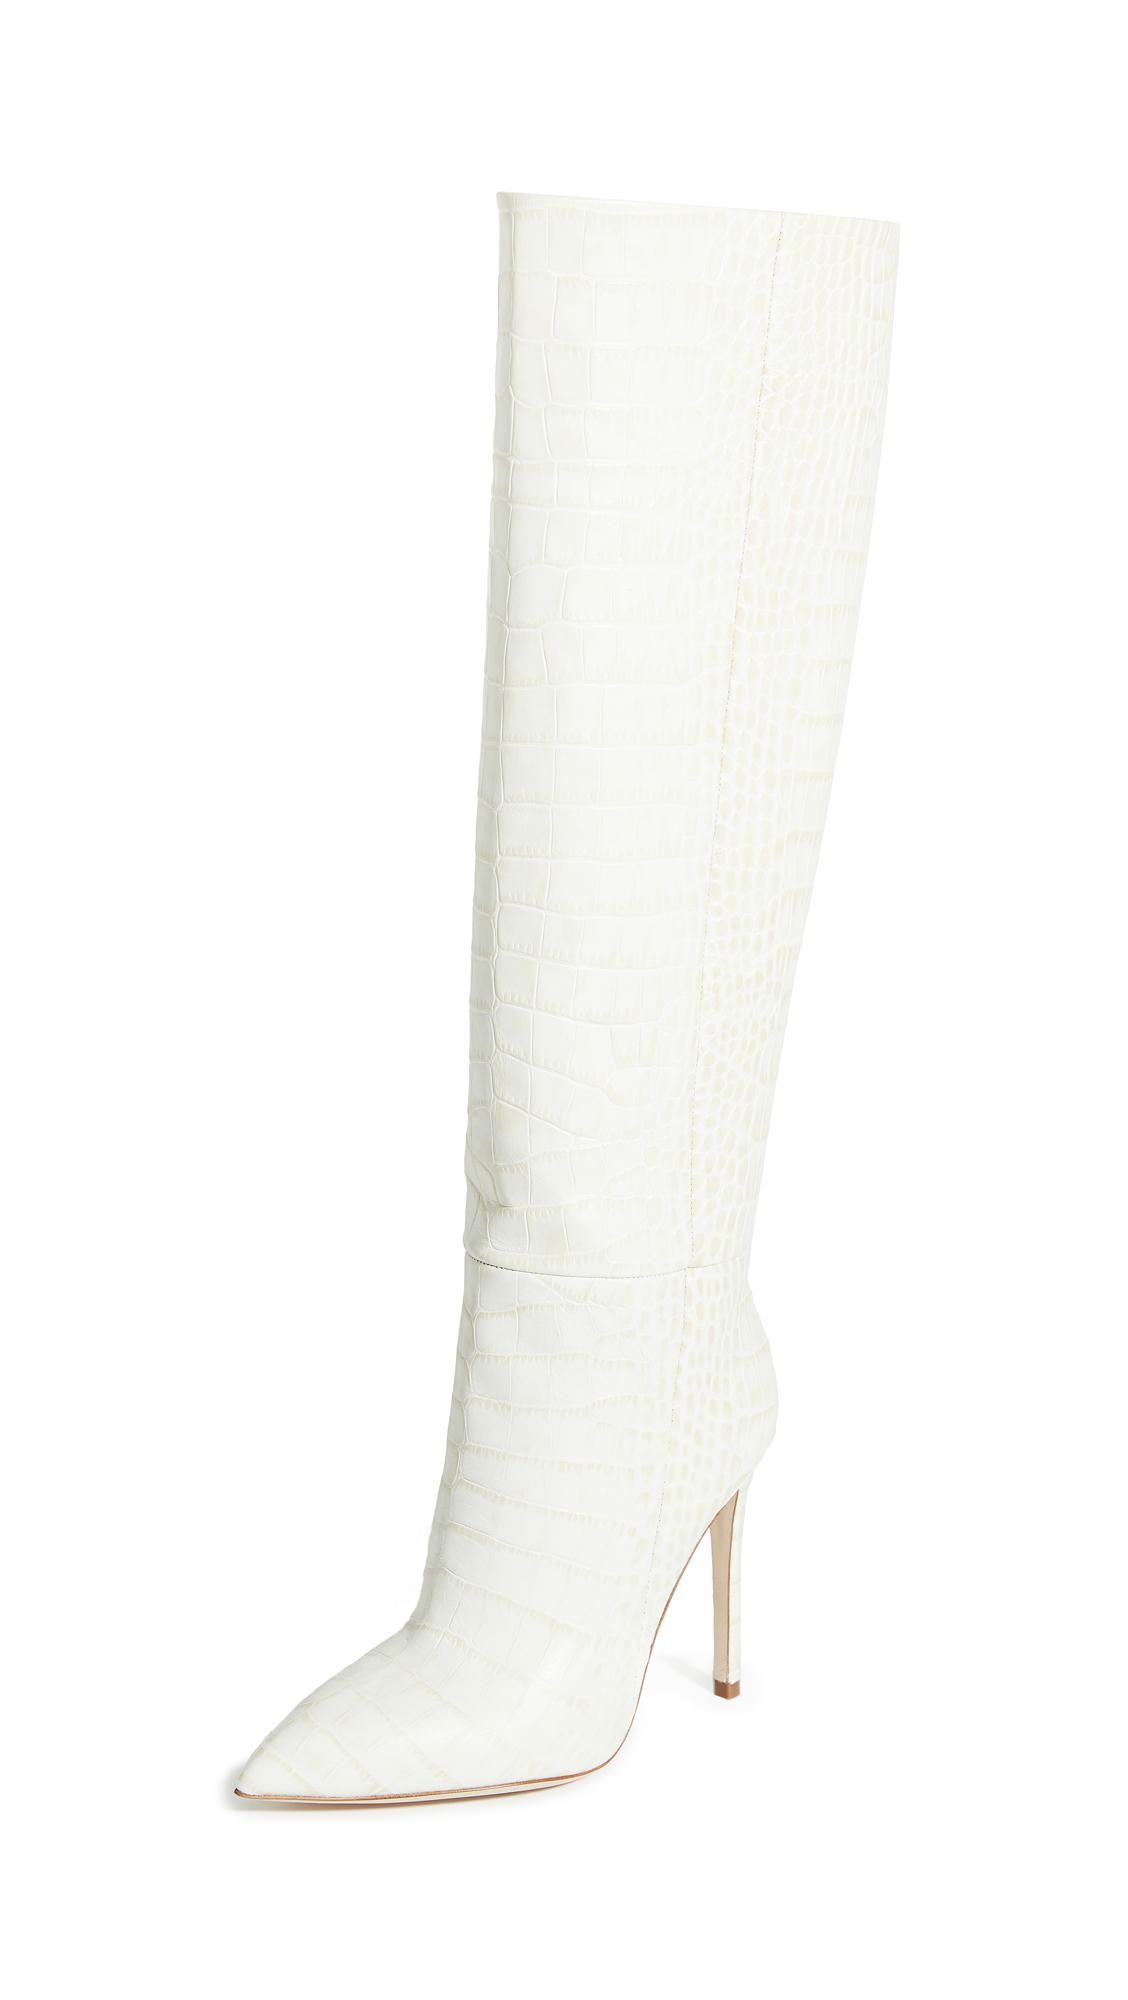 Paris Texas Soft Moc Croco Tall Boots - 30% Off Sale